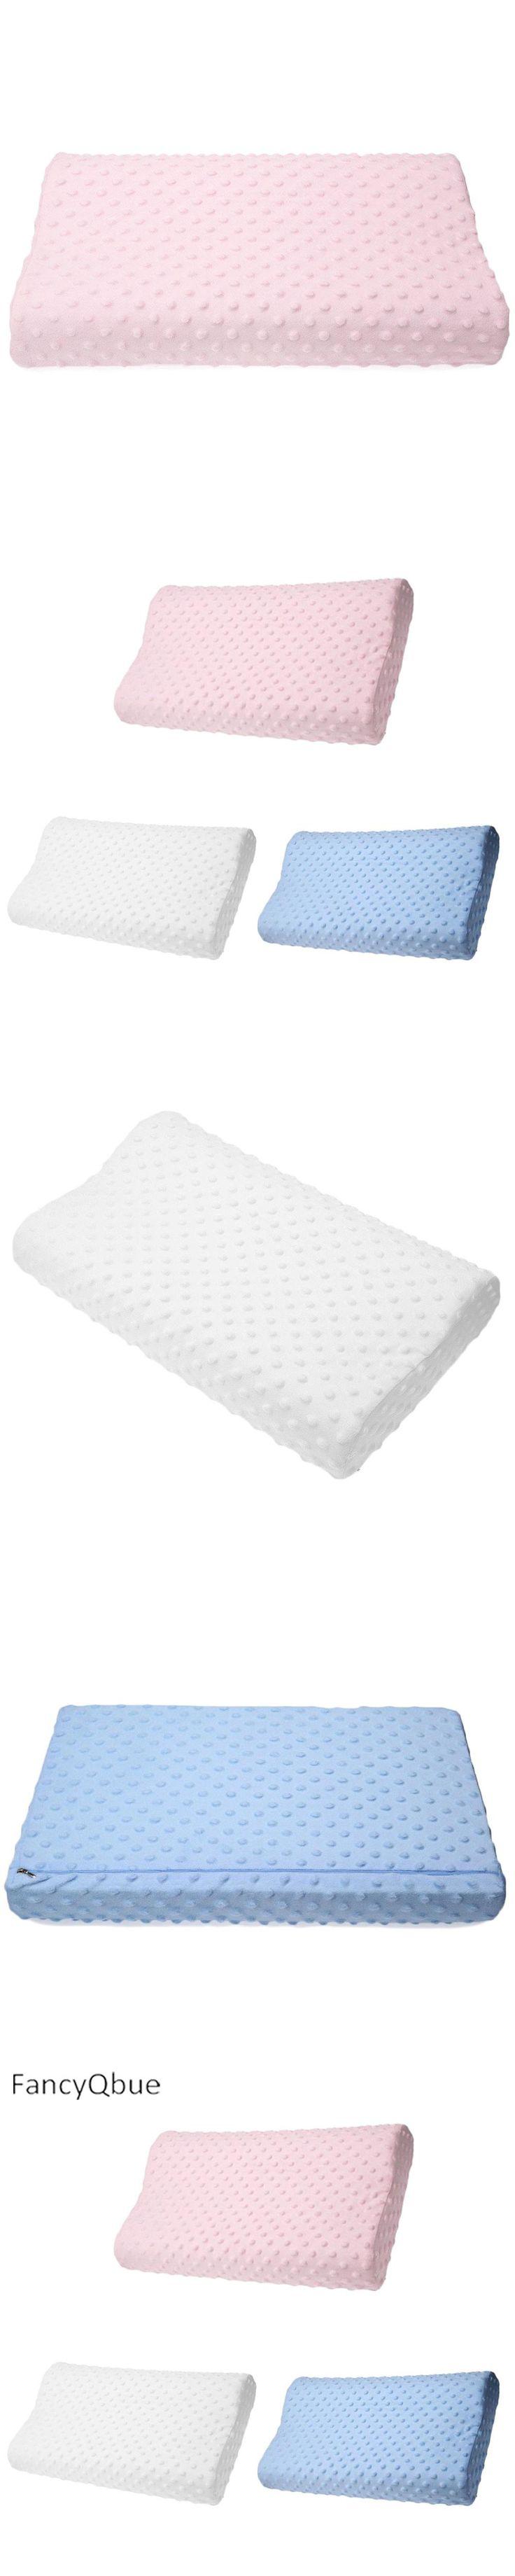 new memory foam pillow 3 colors orthopedic pillow latex neck pillow fiber slow rebound soft pillow